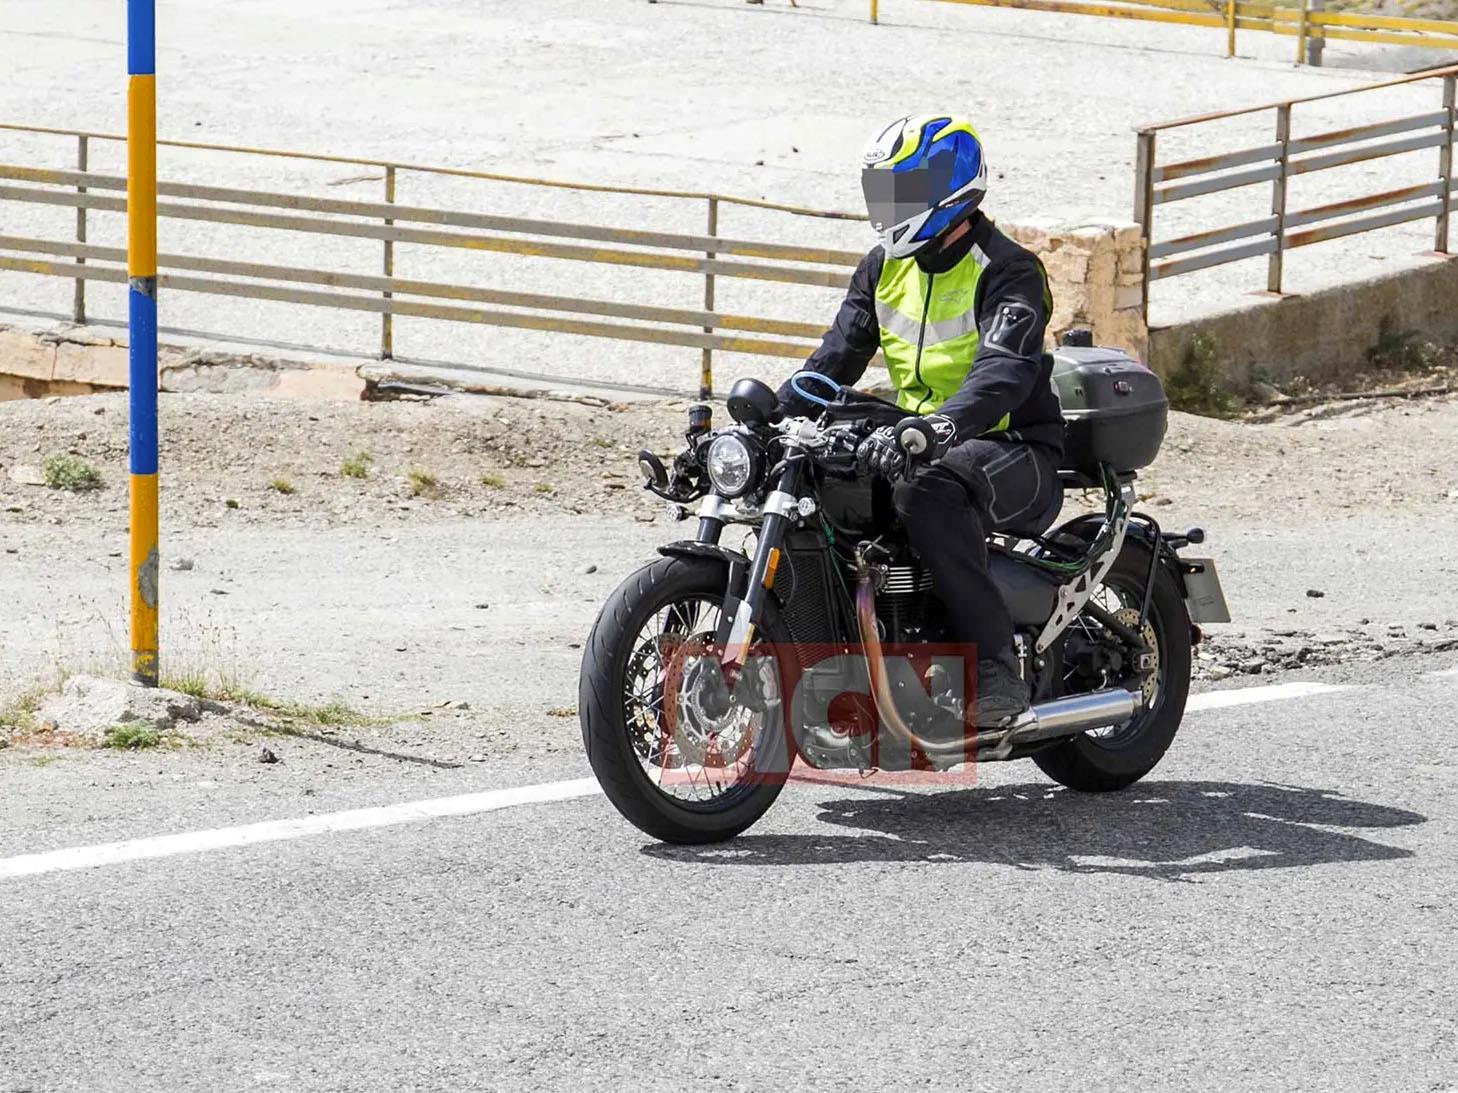 Triumph Bobber TFC spied in testing